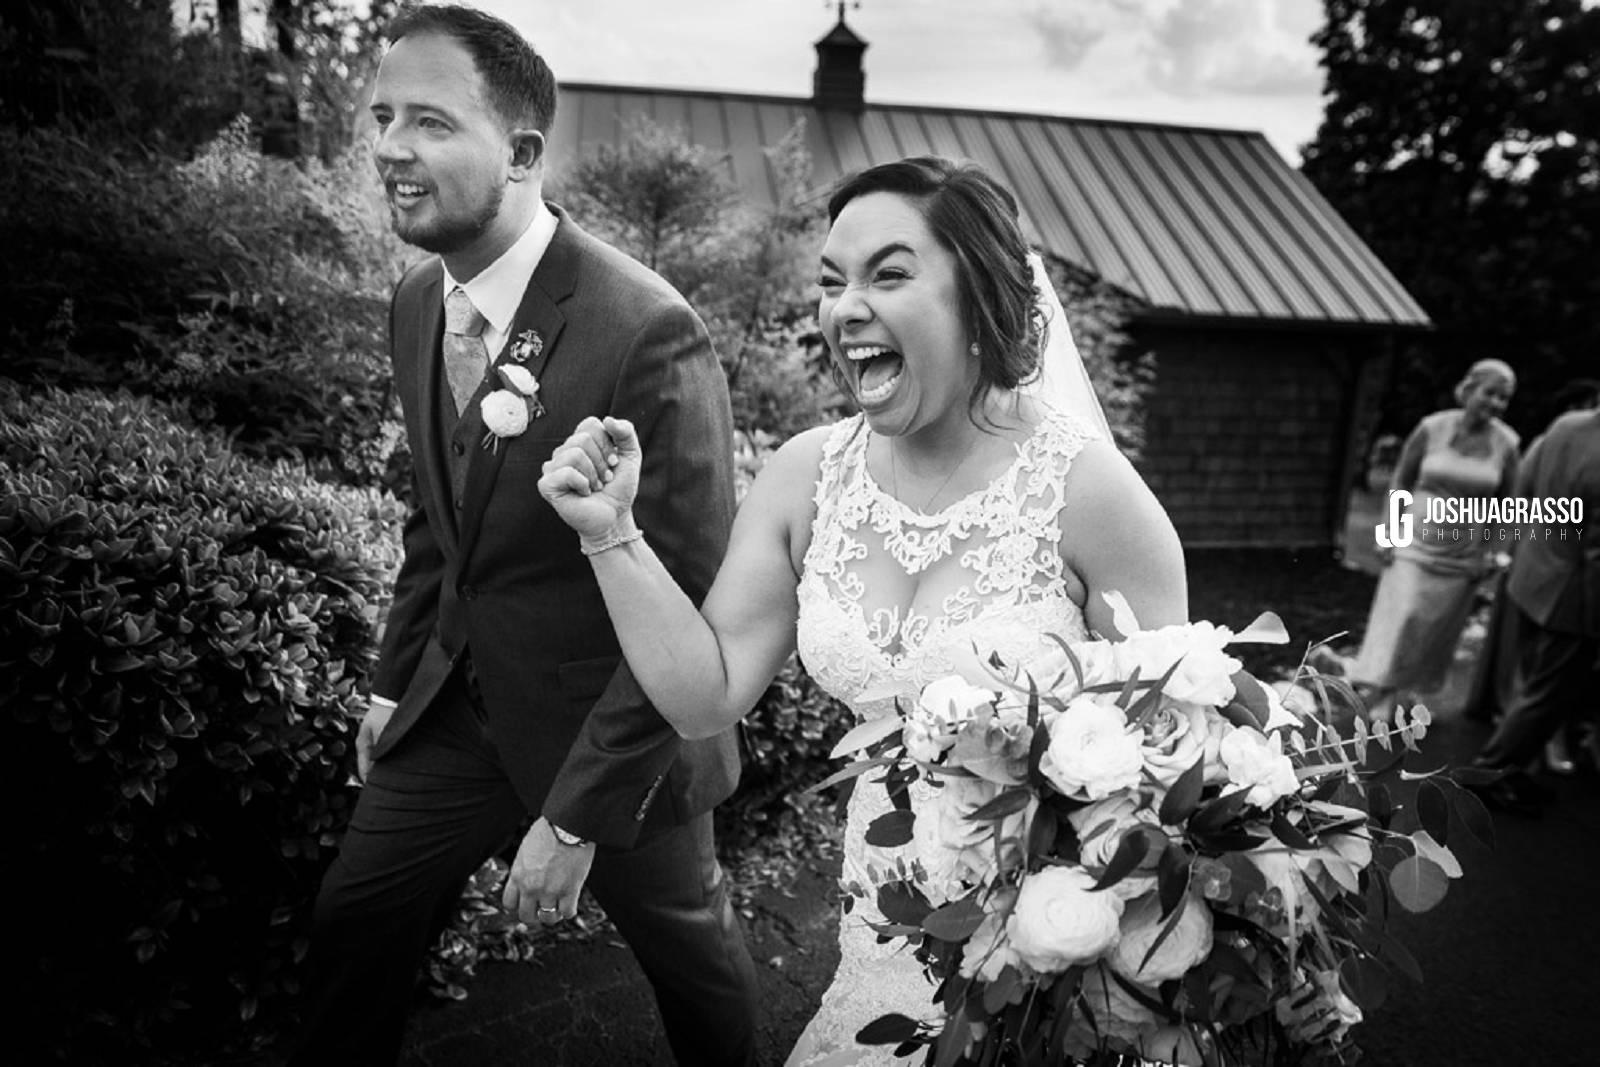 Best-Atlanta-wedding-Photographer-2018-Joshua-Grasso (33 of 54)